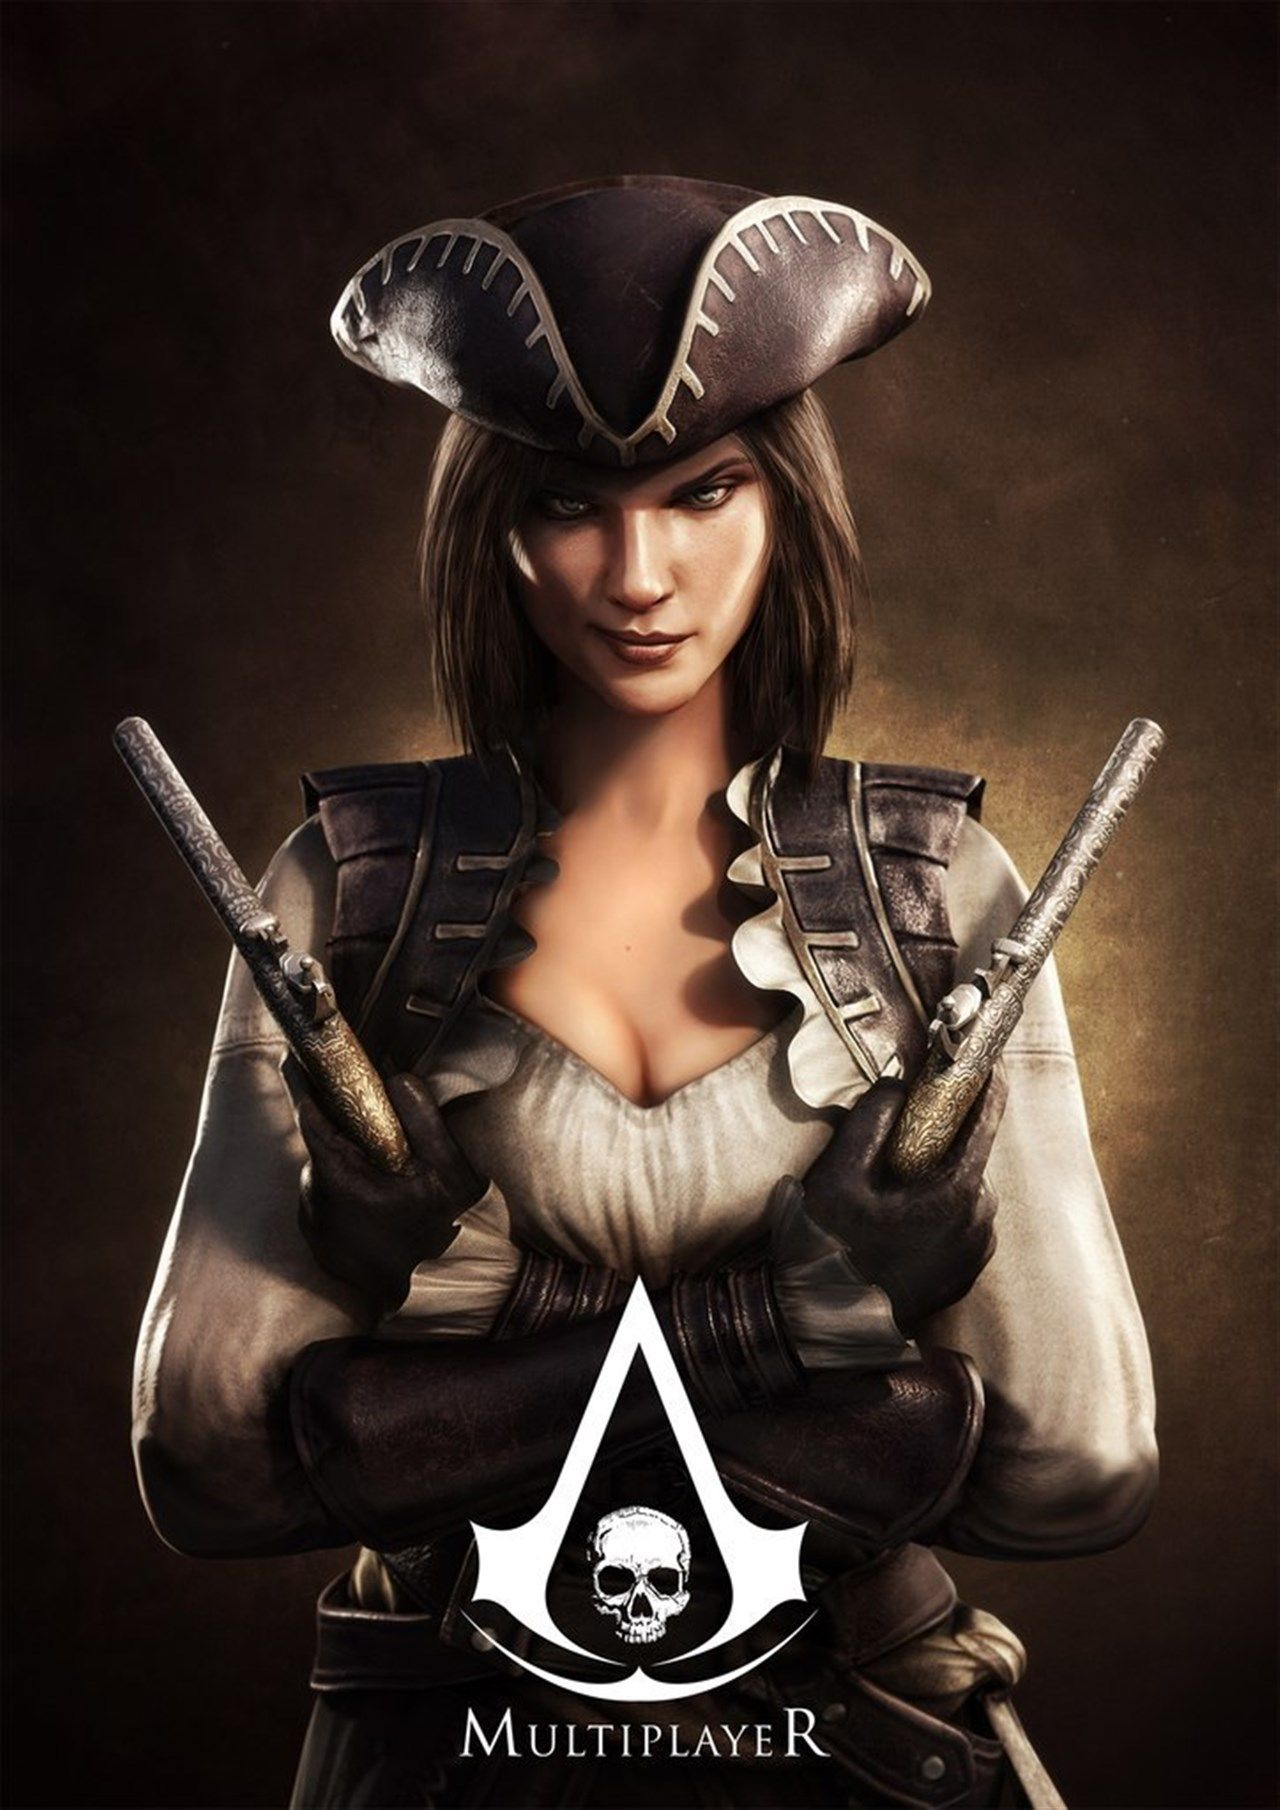 Assassins Creed 4 Multiplayer Femlae wallpaper 1280x1810